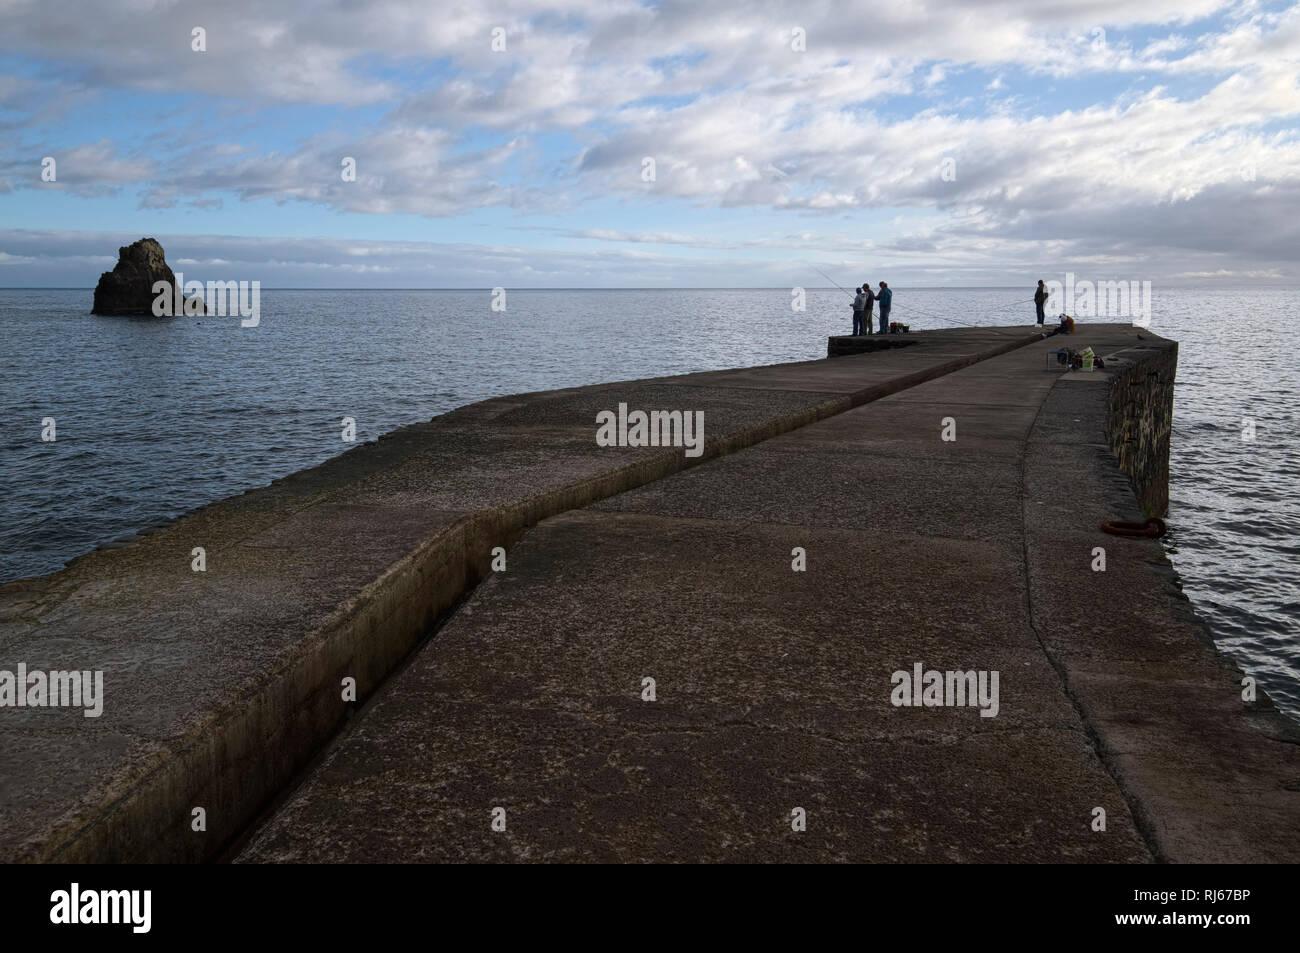 Portugal, Madeira, Funchal, Meer, Steg, Angler, Horizont - Stock Image